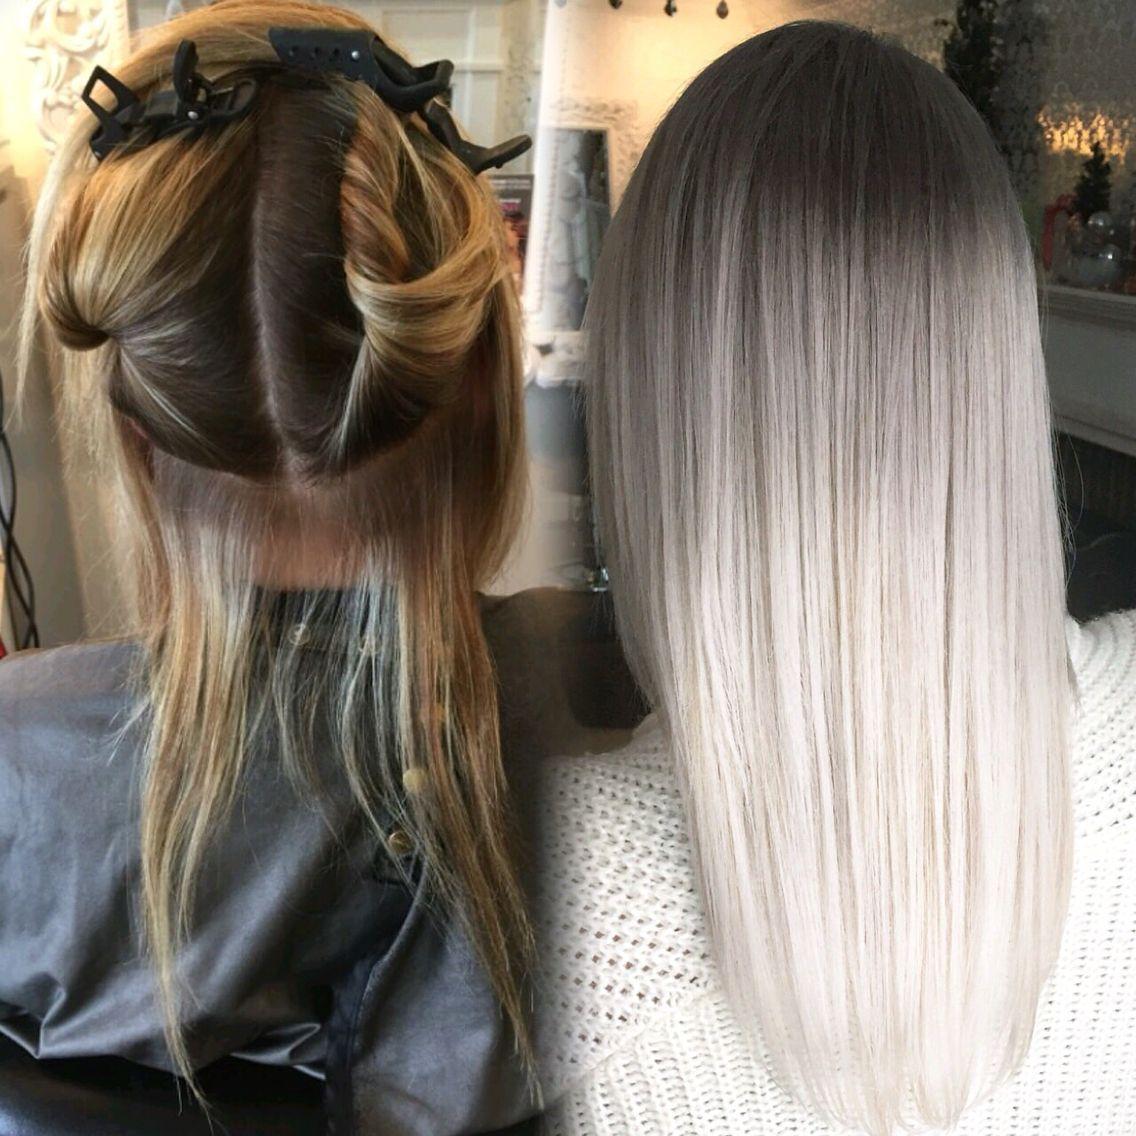 Fabelhaft Graue Haare färben: So funktioniert! | Hair in 2018 | Pinterest #LV_39